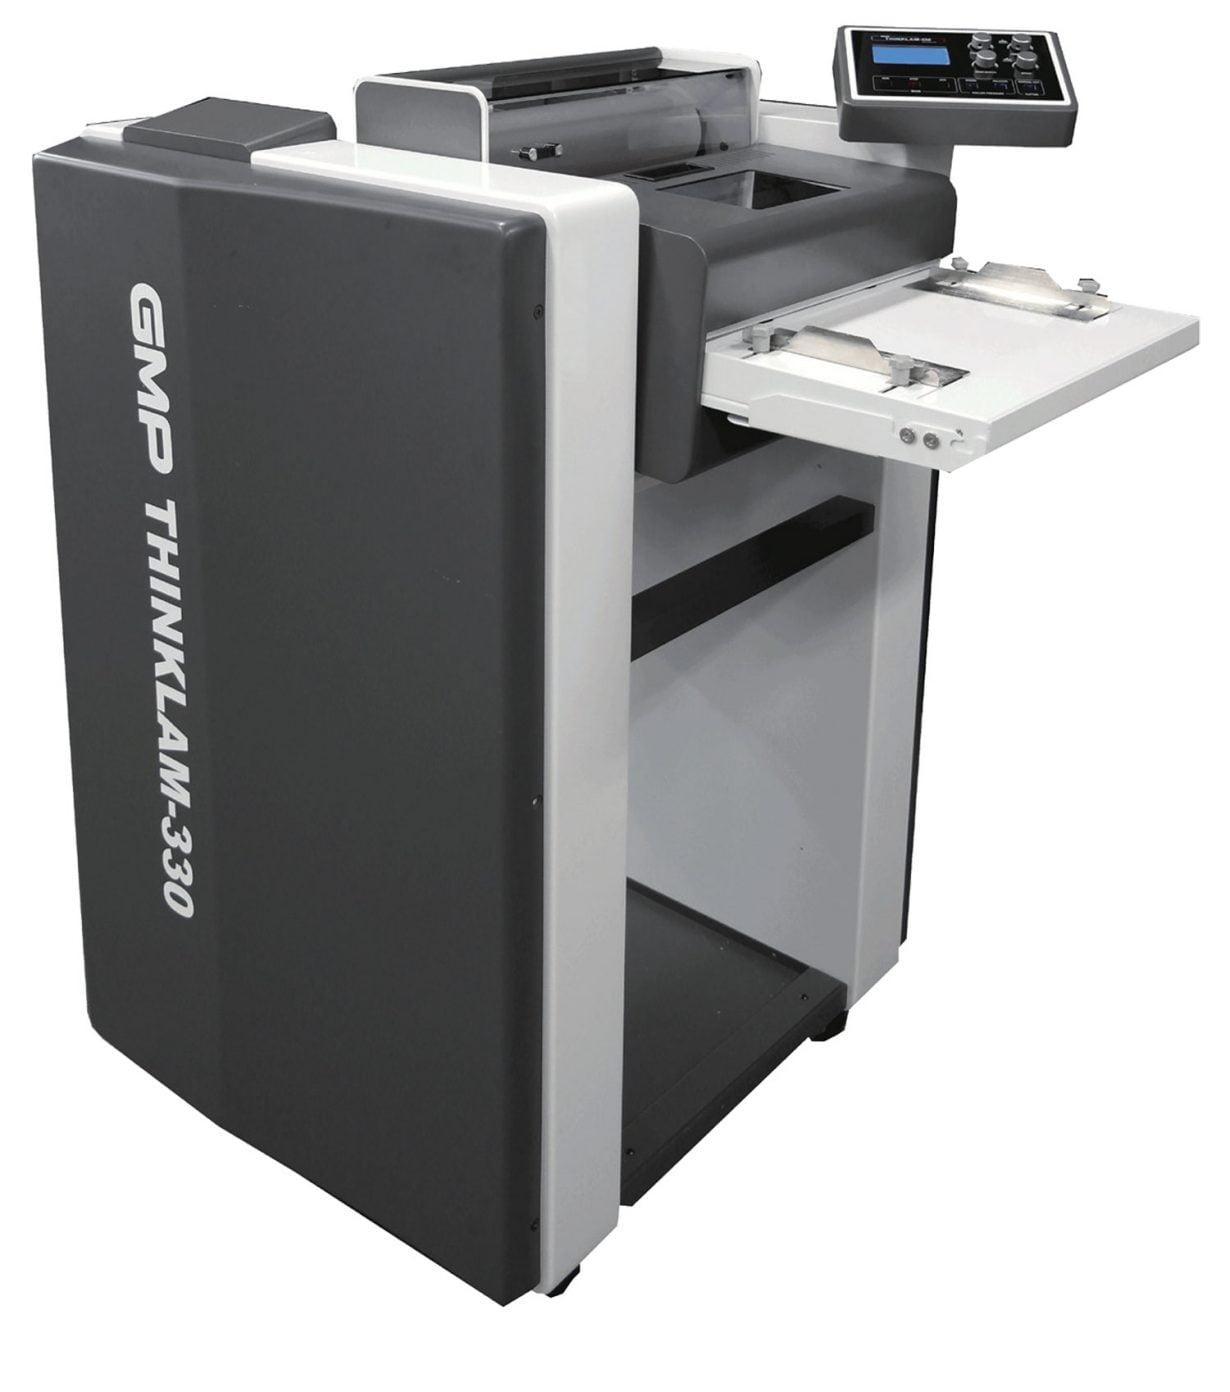 header-img-gmp-thinklam-330-automatisch-dubbelzijdig-lamineersysteem